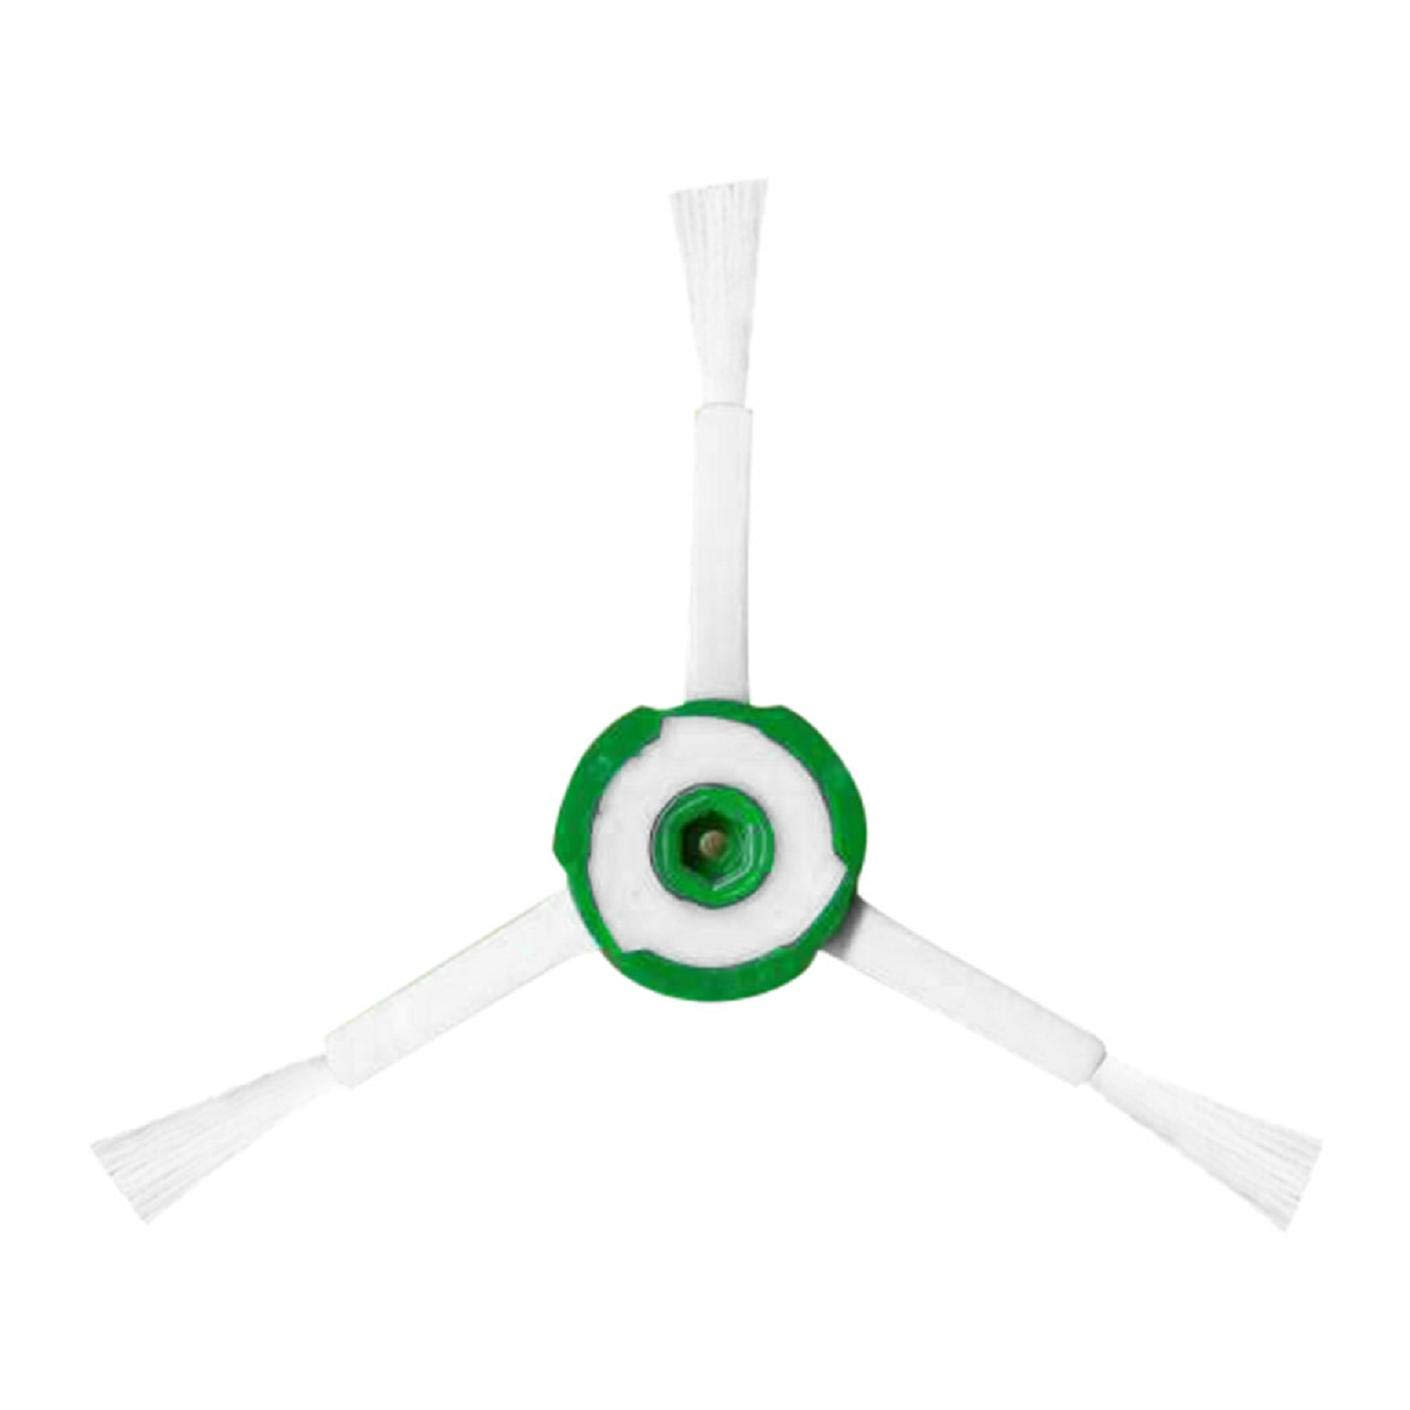 Feccile 1PC Replacement Side Brush for iRobot Roomba i7 i7+/i7 Plus E5 E6 E7 Vacuum Cleaner